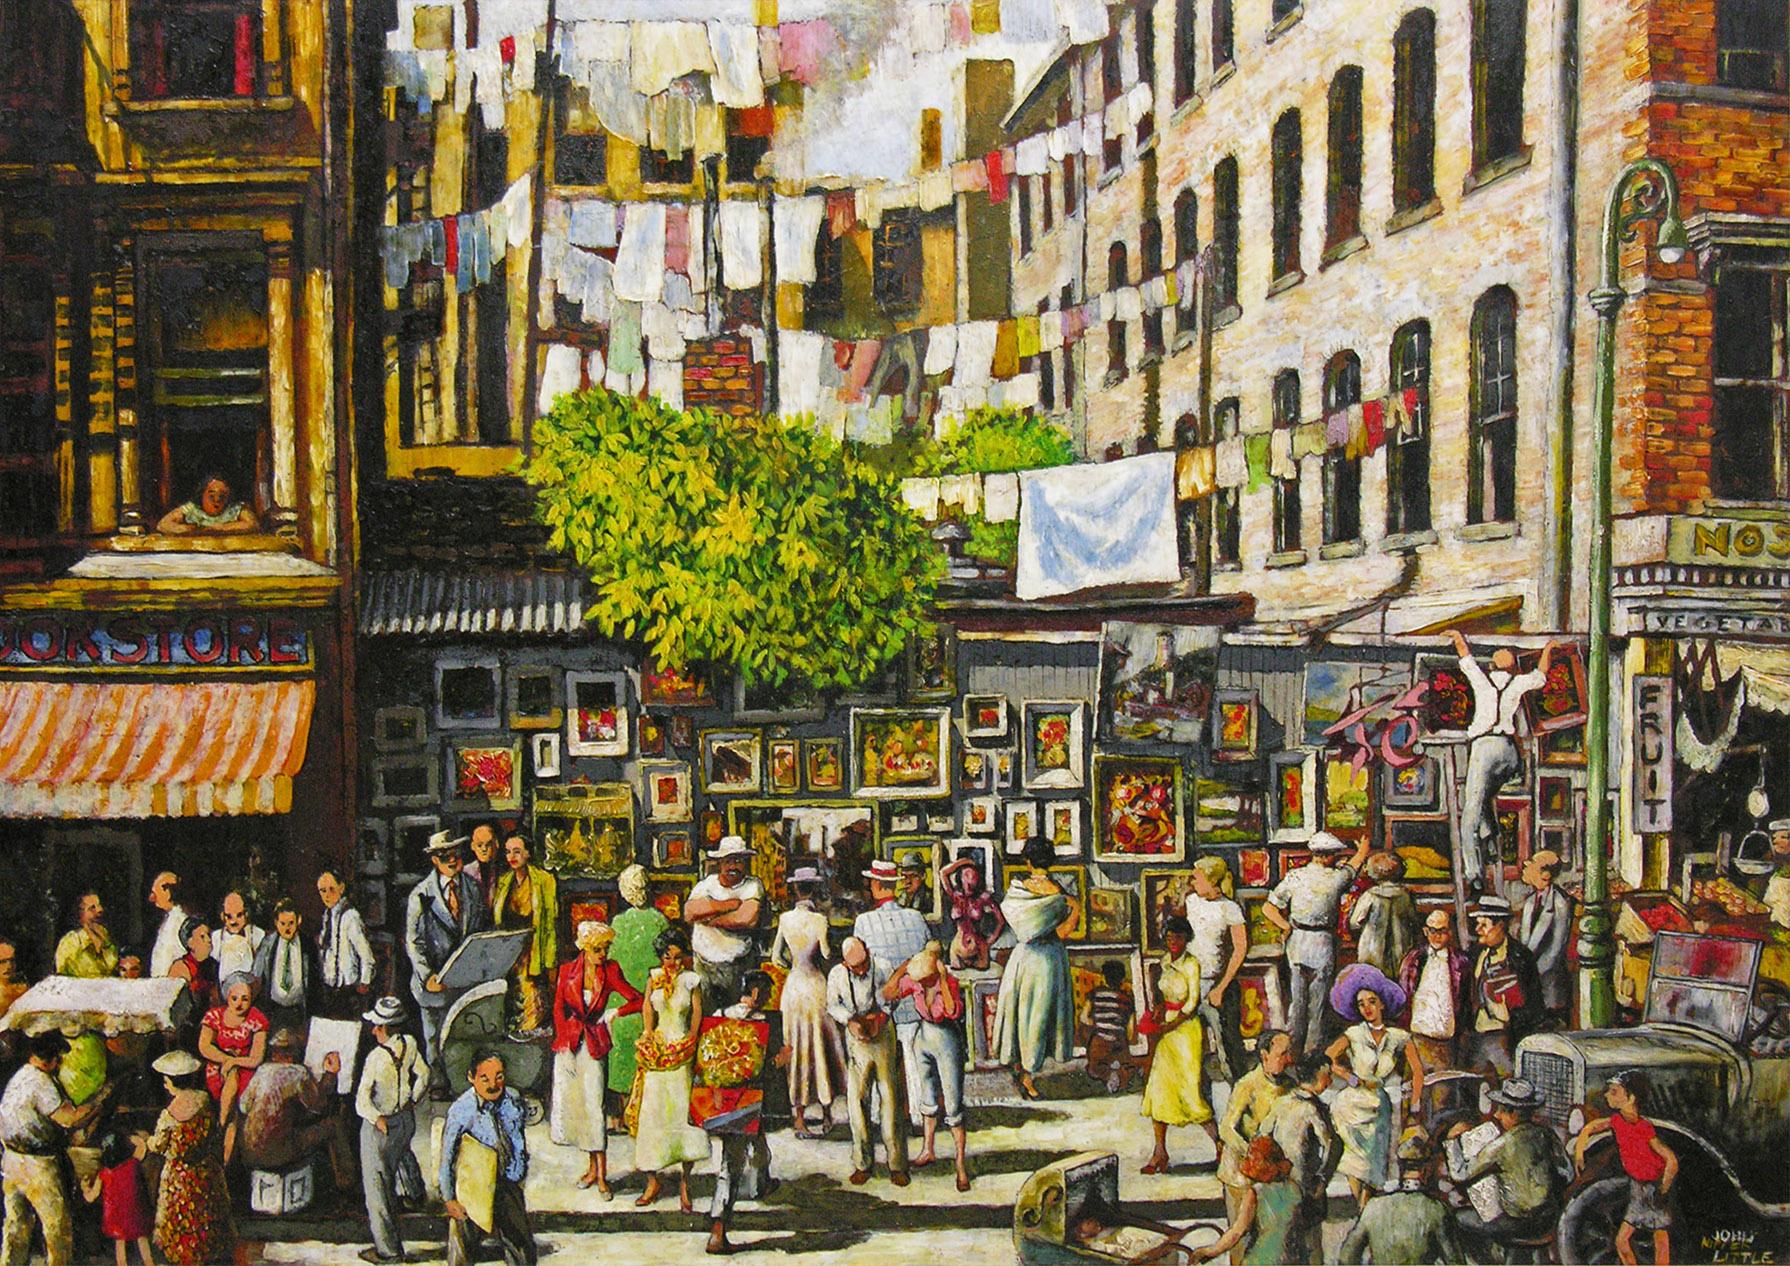 John Little, R.C.A., Outdoor Art Exhibition near Washington Square ...